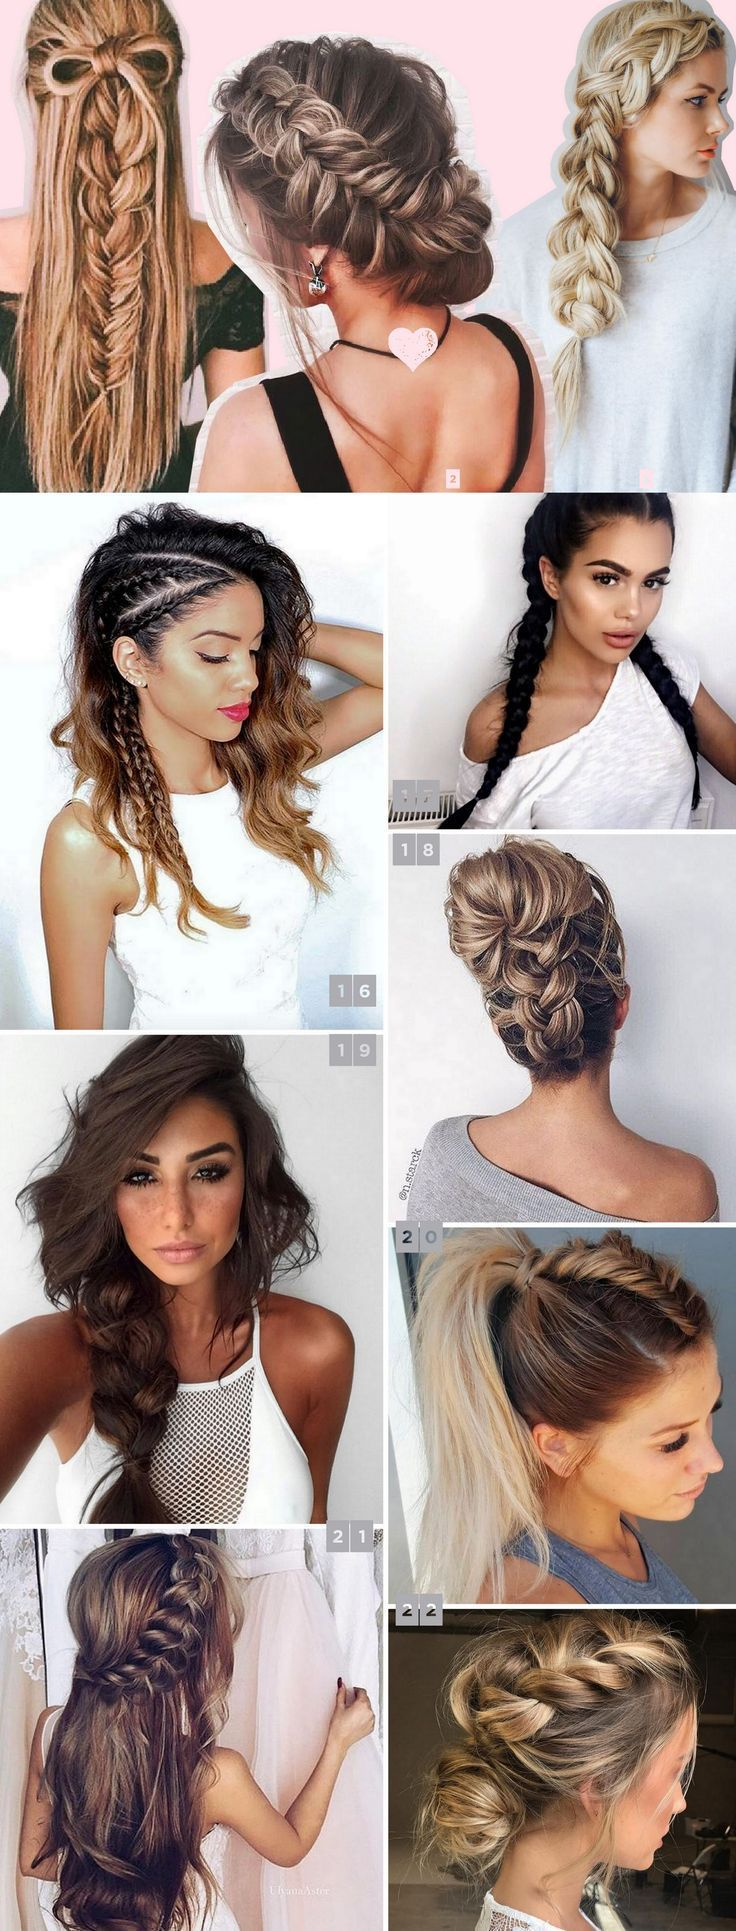 Best hairstyle for widows peak women womens hairstyles long hair